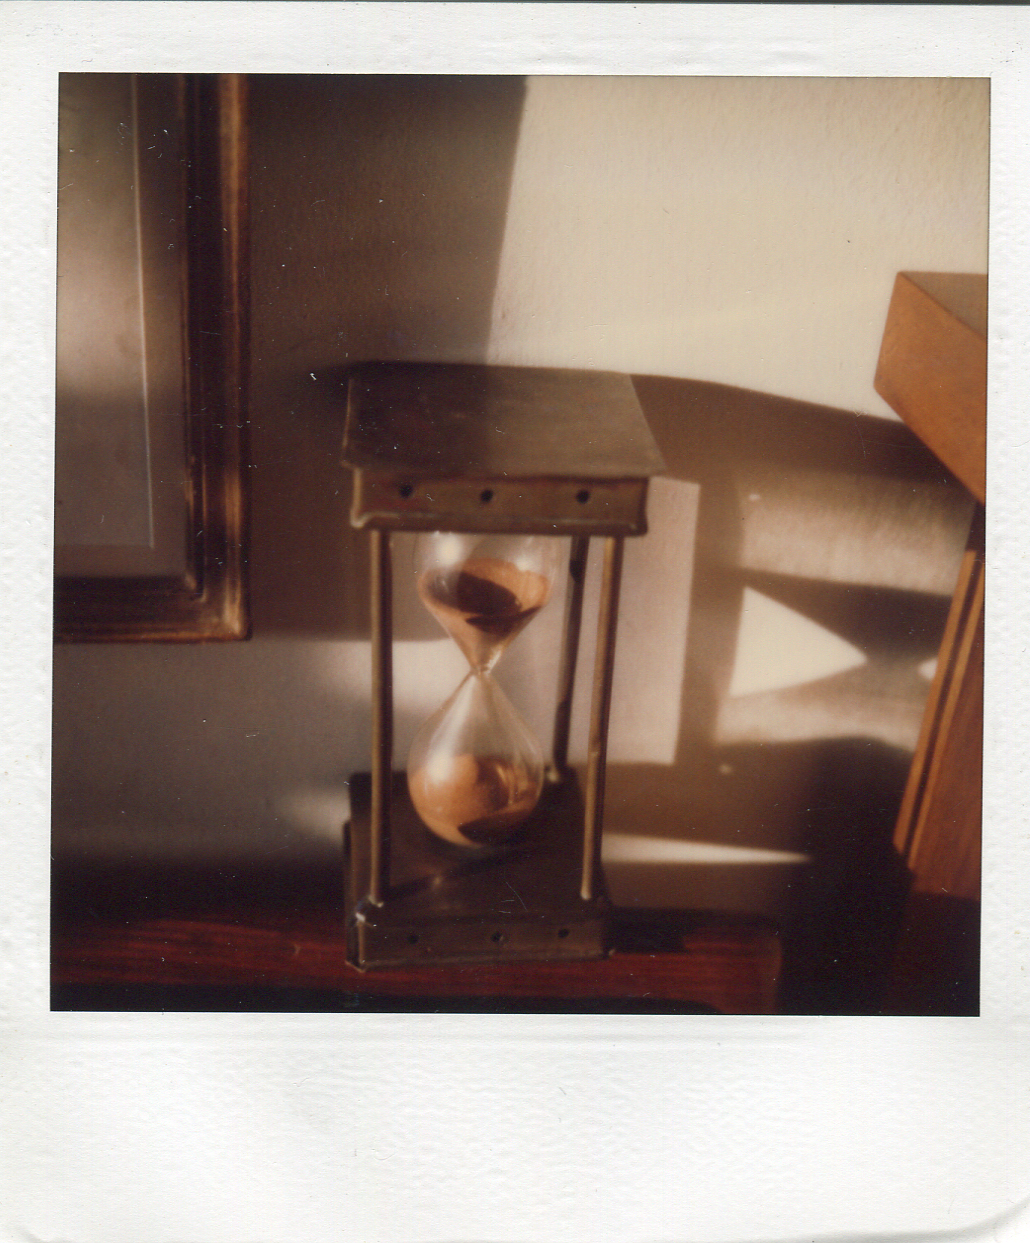 "André Kertész, ""April 20"" (1980), SX-70 Polaroid, 4.25 x 3.5inches (courtesy Ricco/Maresca Gallery)"